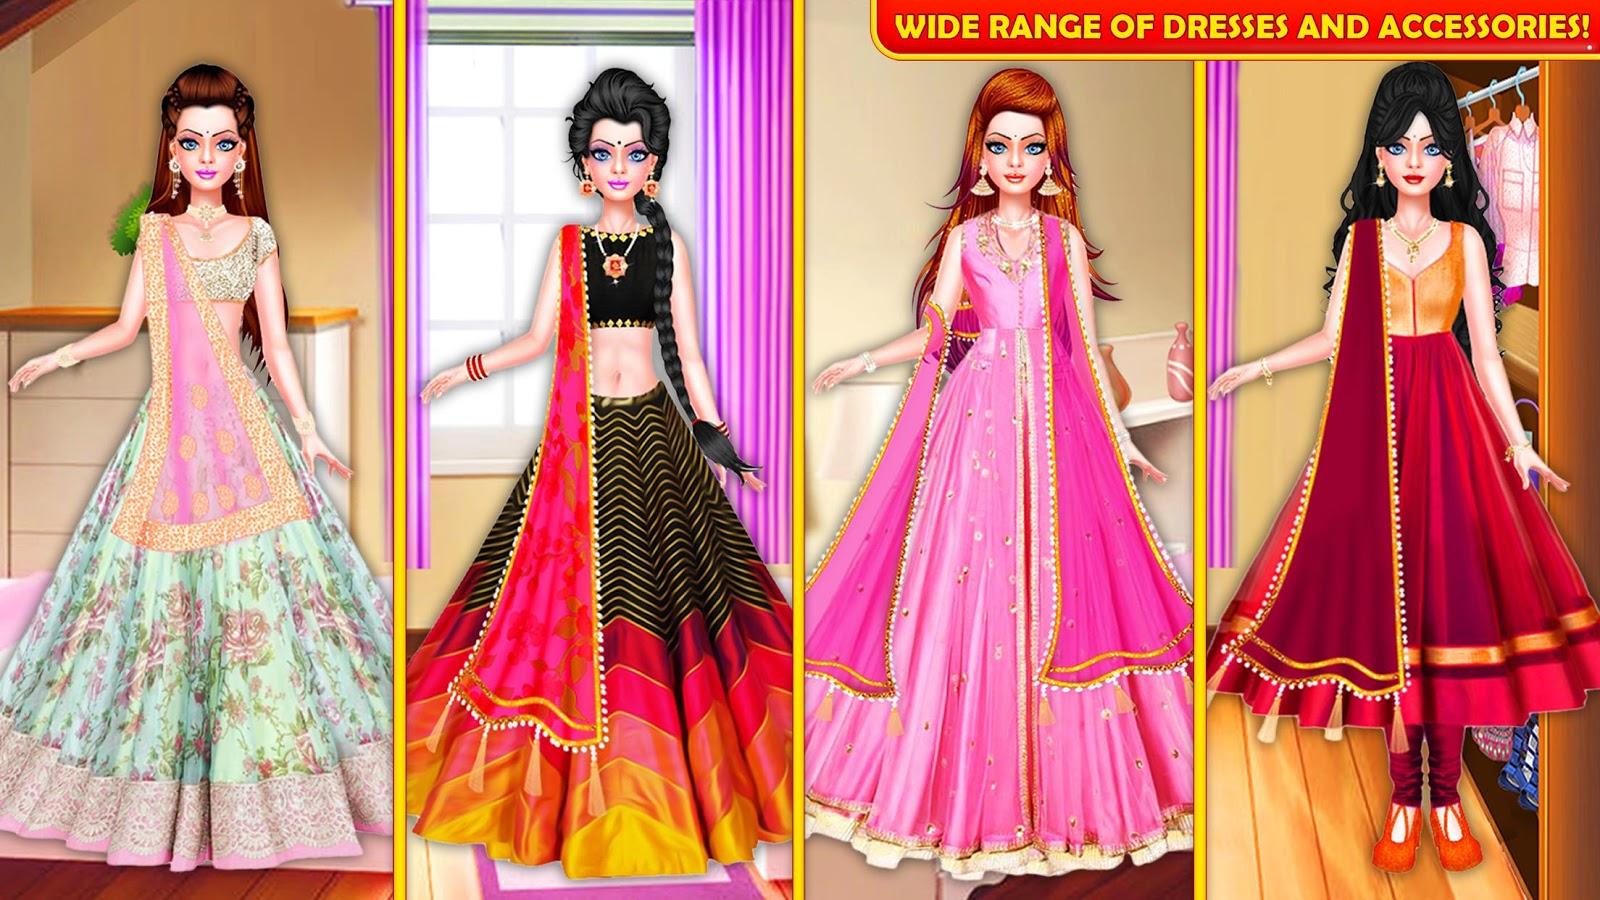 Indian Bride Dress Up Games Play Free Online Raveitsafe